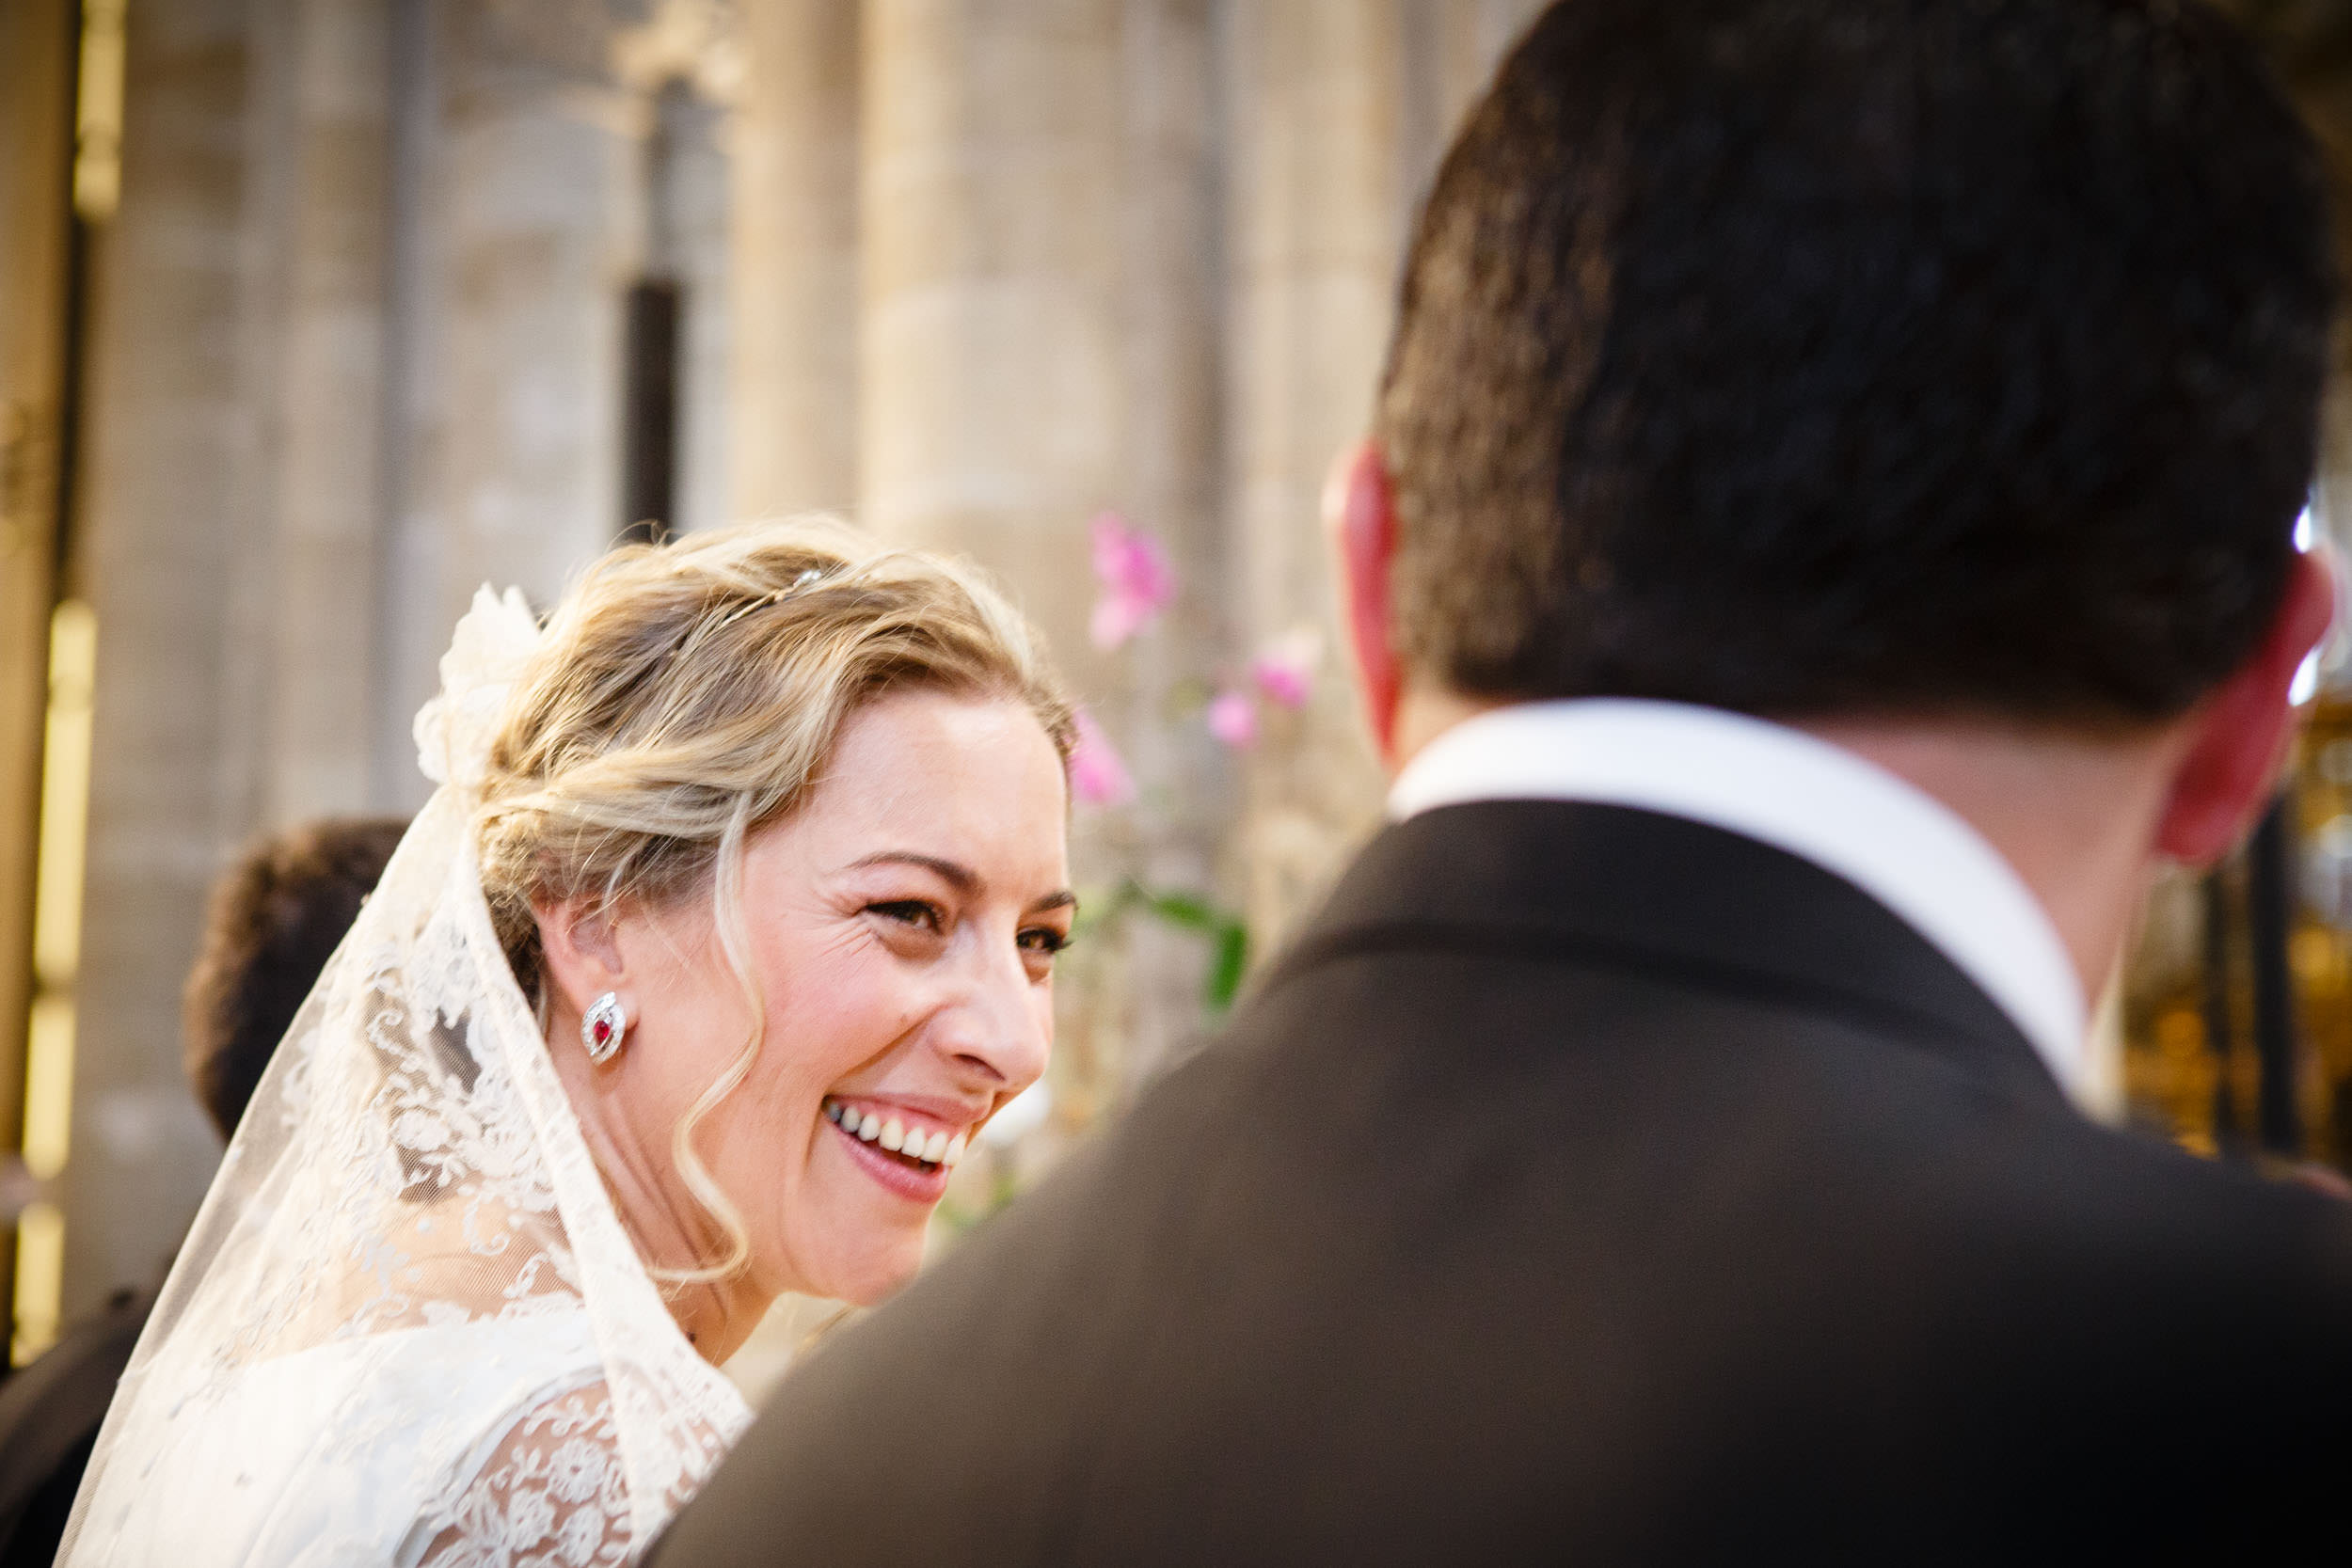 Wedding Photographer in Santo Domingo de la Calzada and Haro La Rioja Spain - James Sturcke  Photographer | sturcke.org_006.jpg